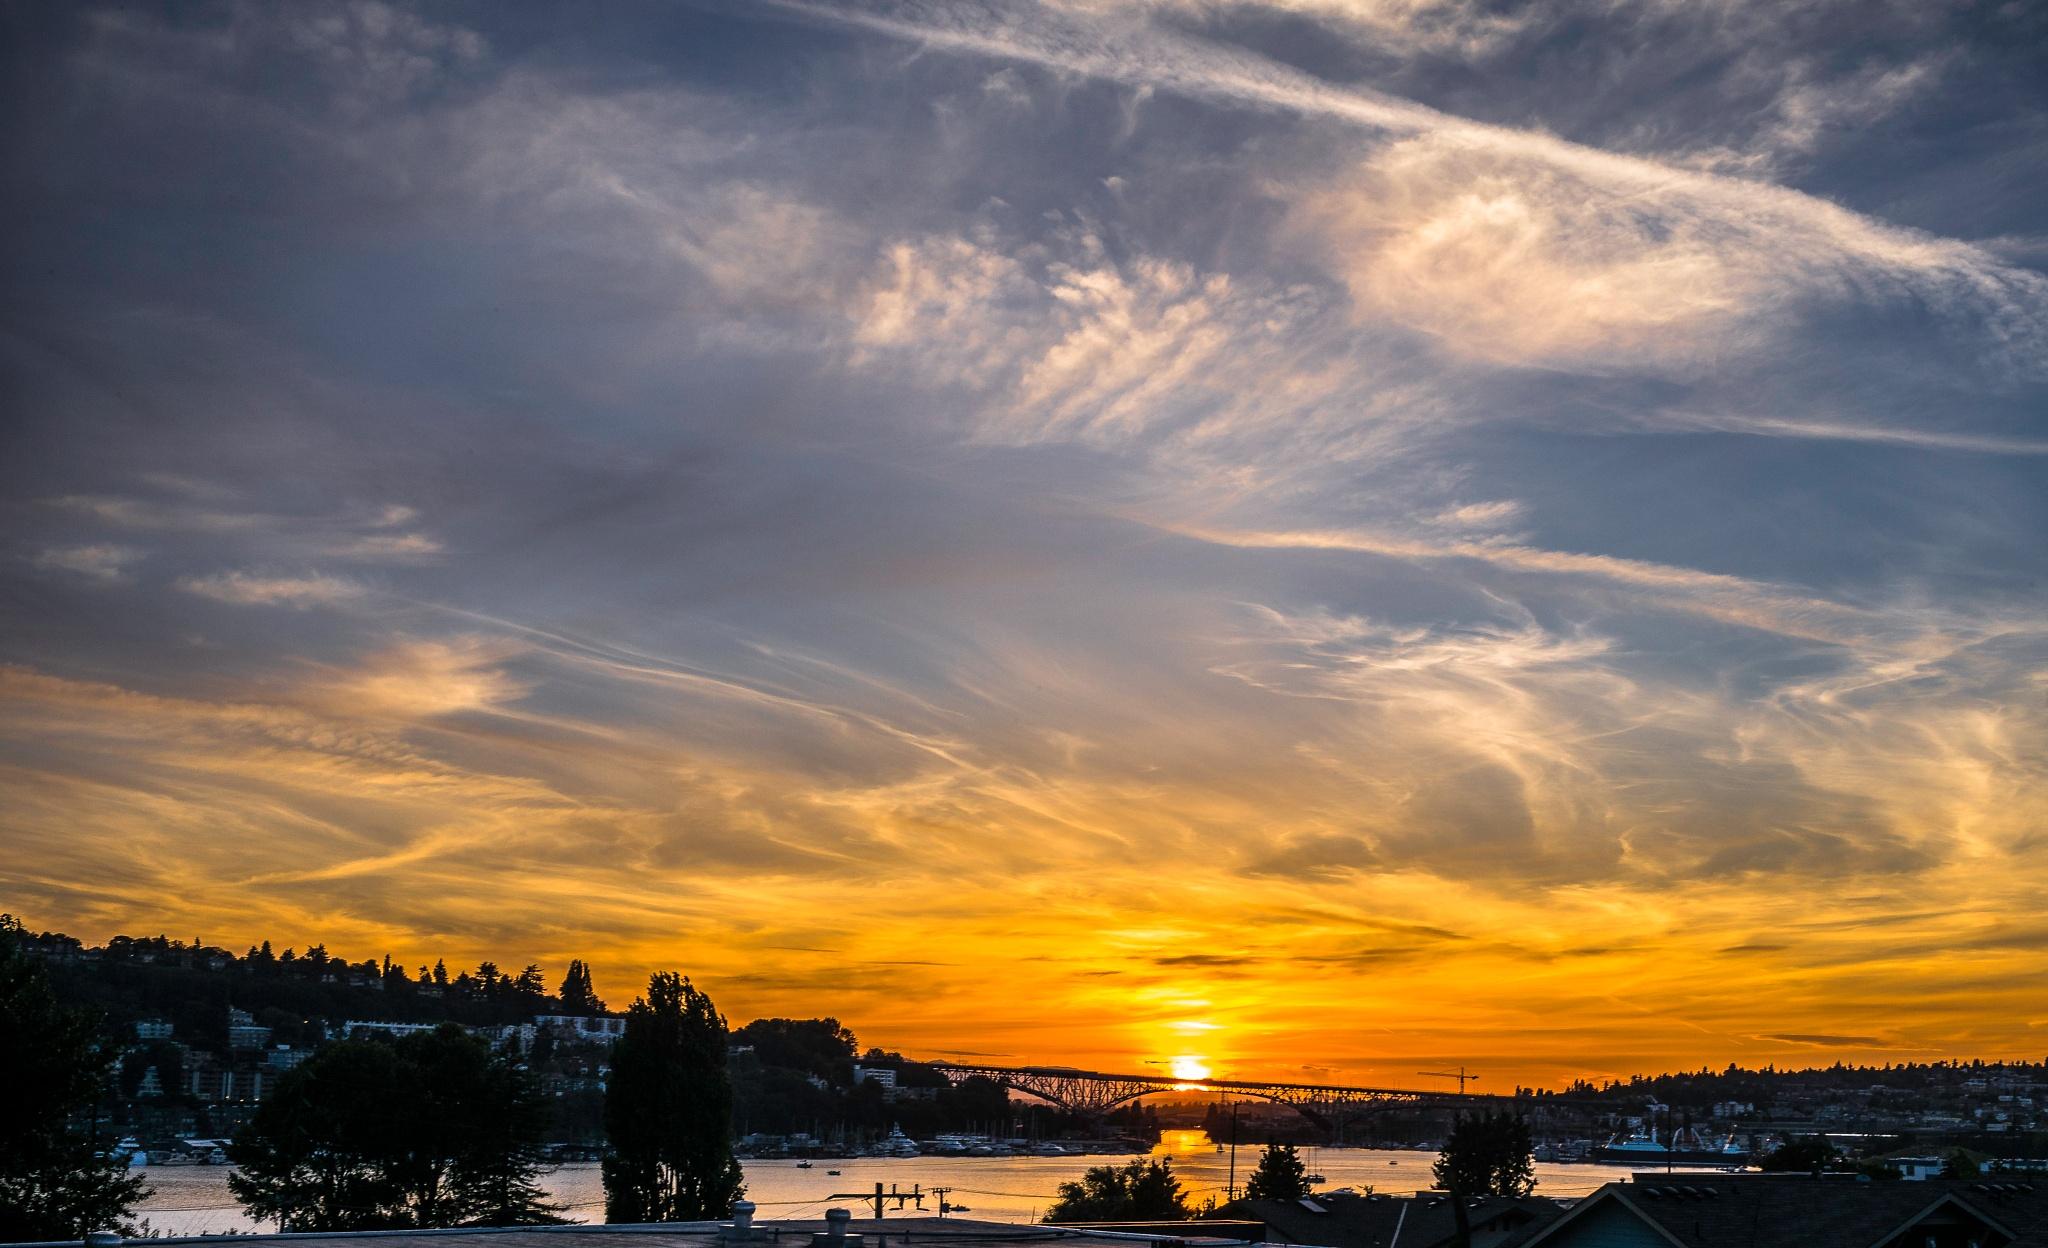 Summer Sunset by Stephen C. Benine